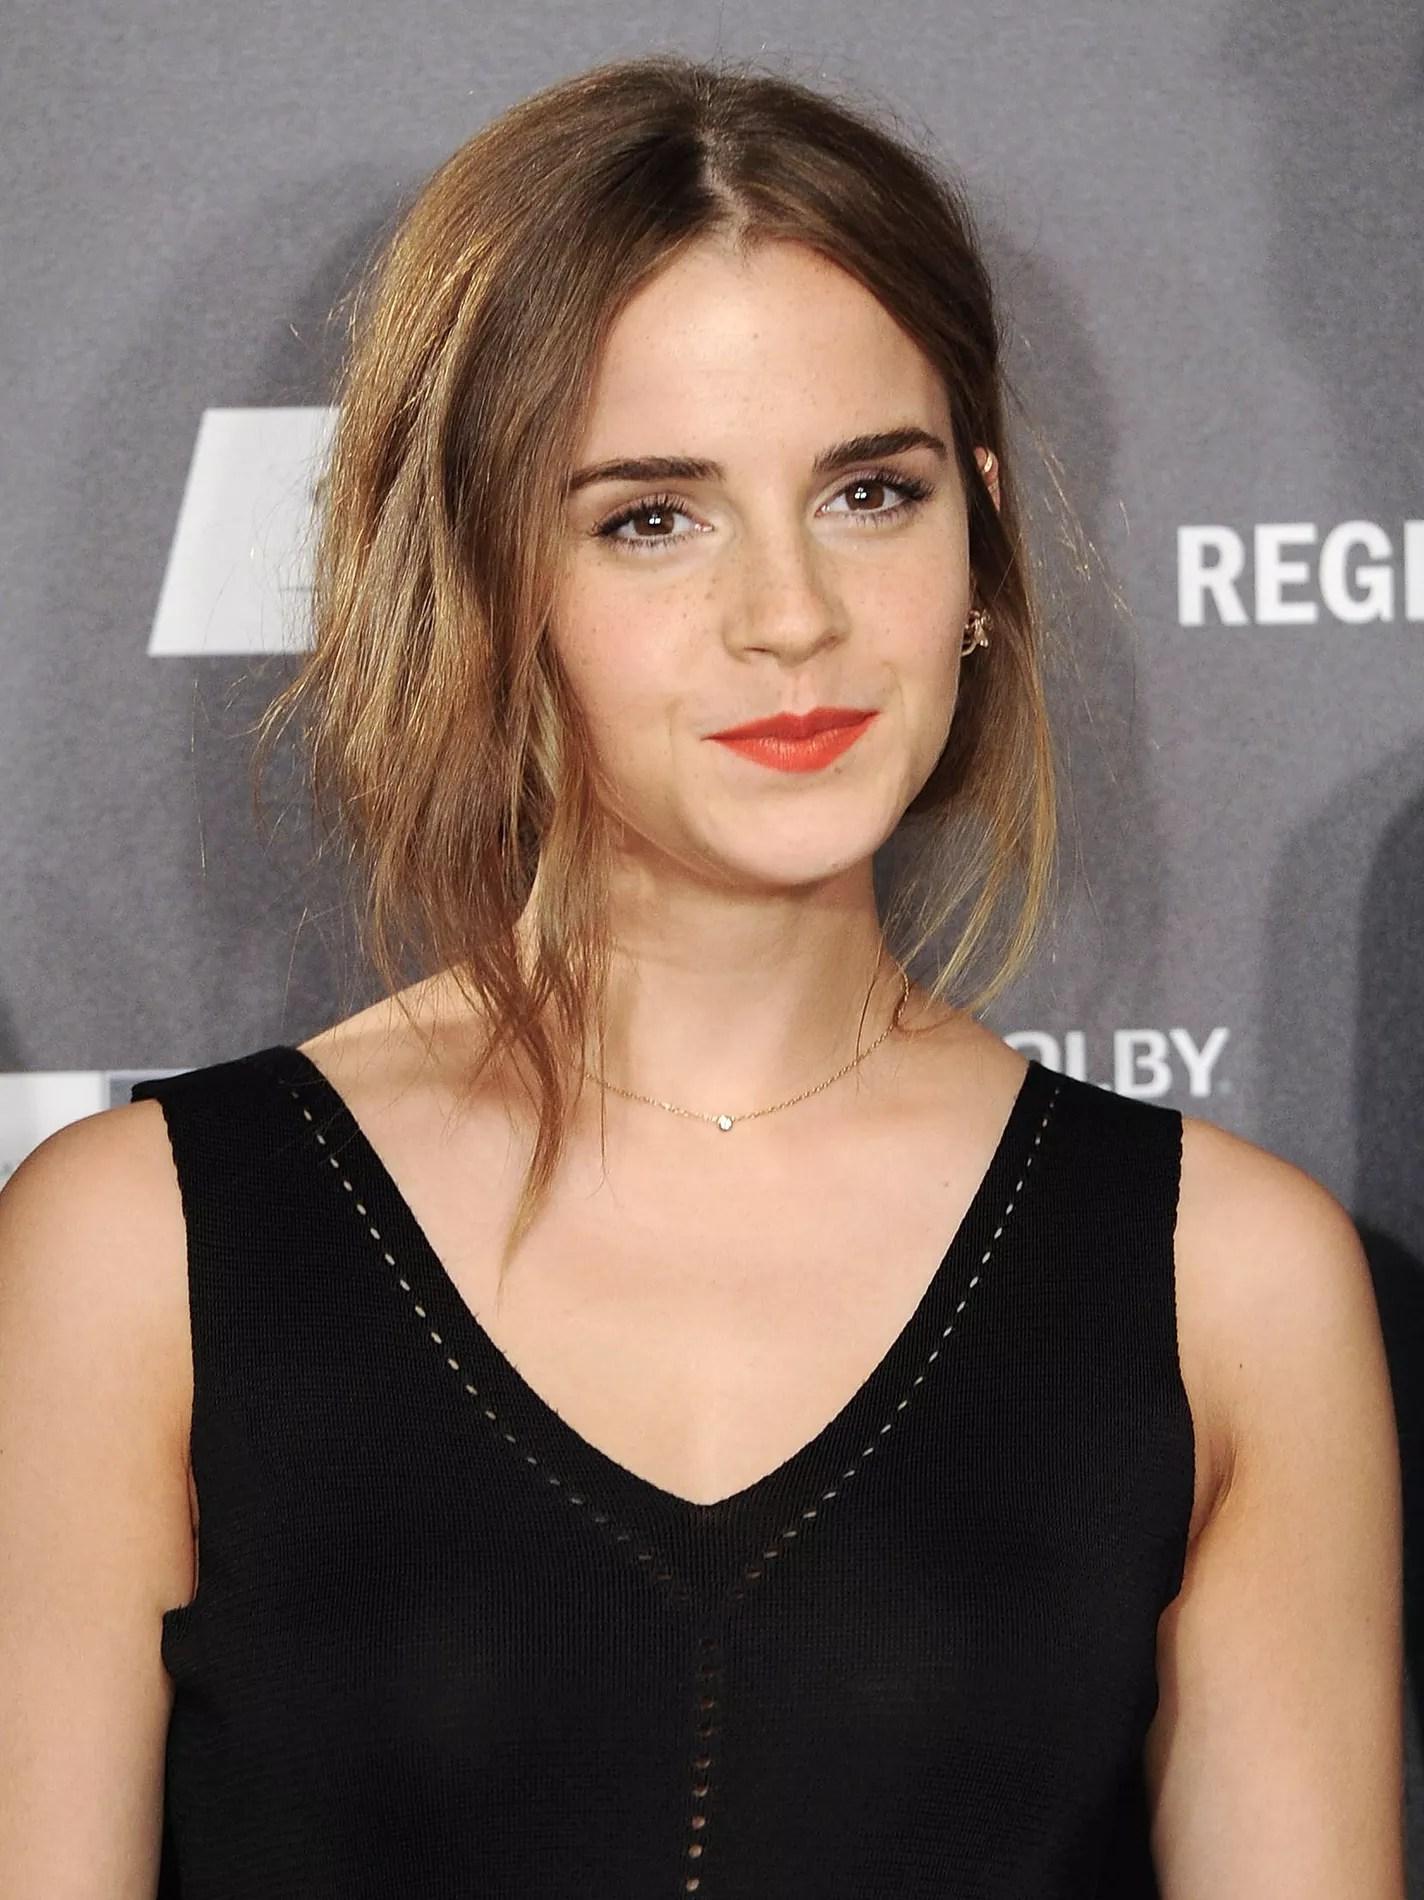 Shelf Wallpaper Iphone Emma Watson Et Son Club De Lecture F 233 Ministe Madame Figaro